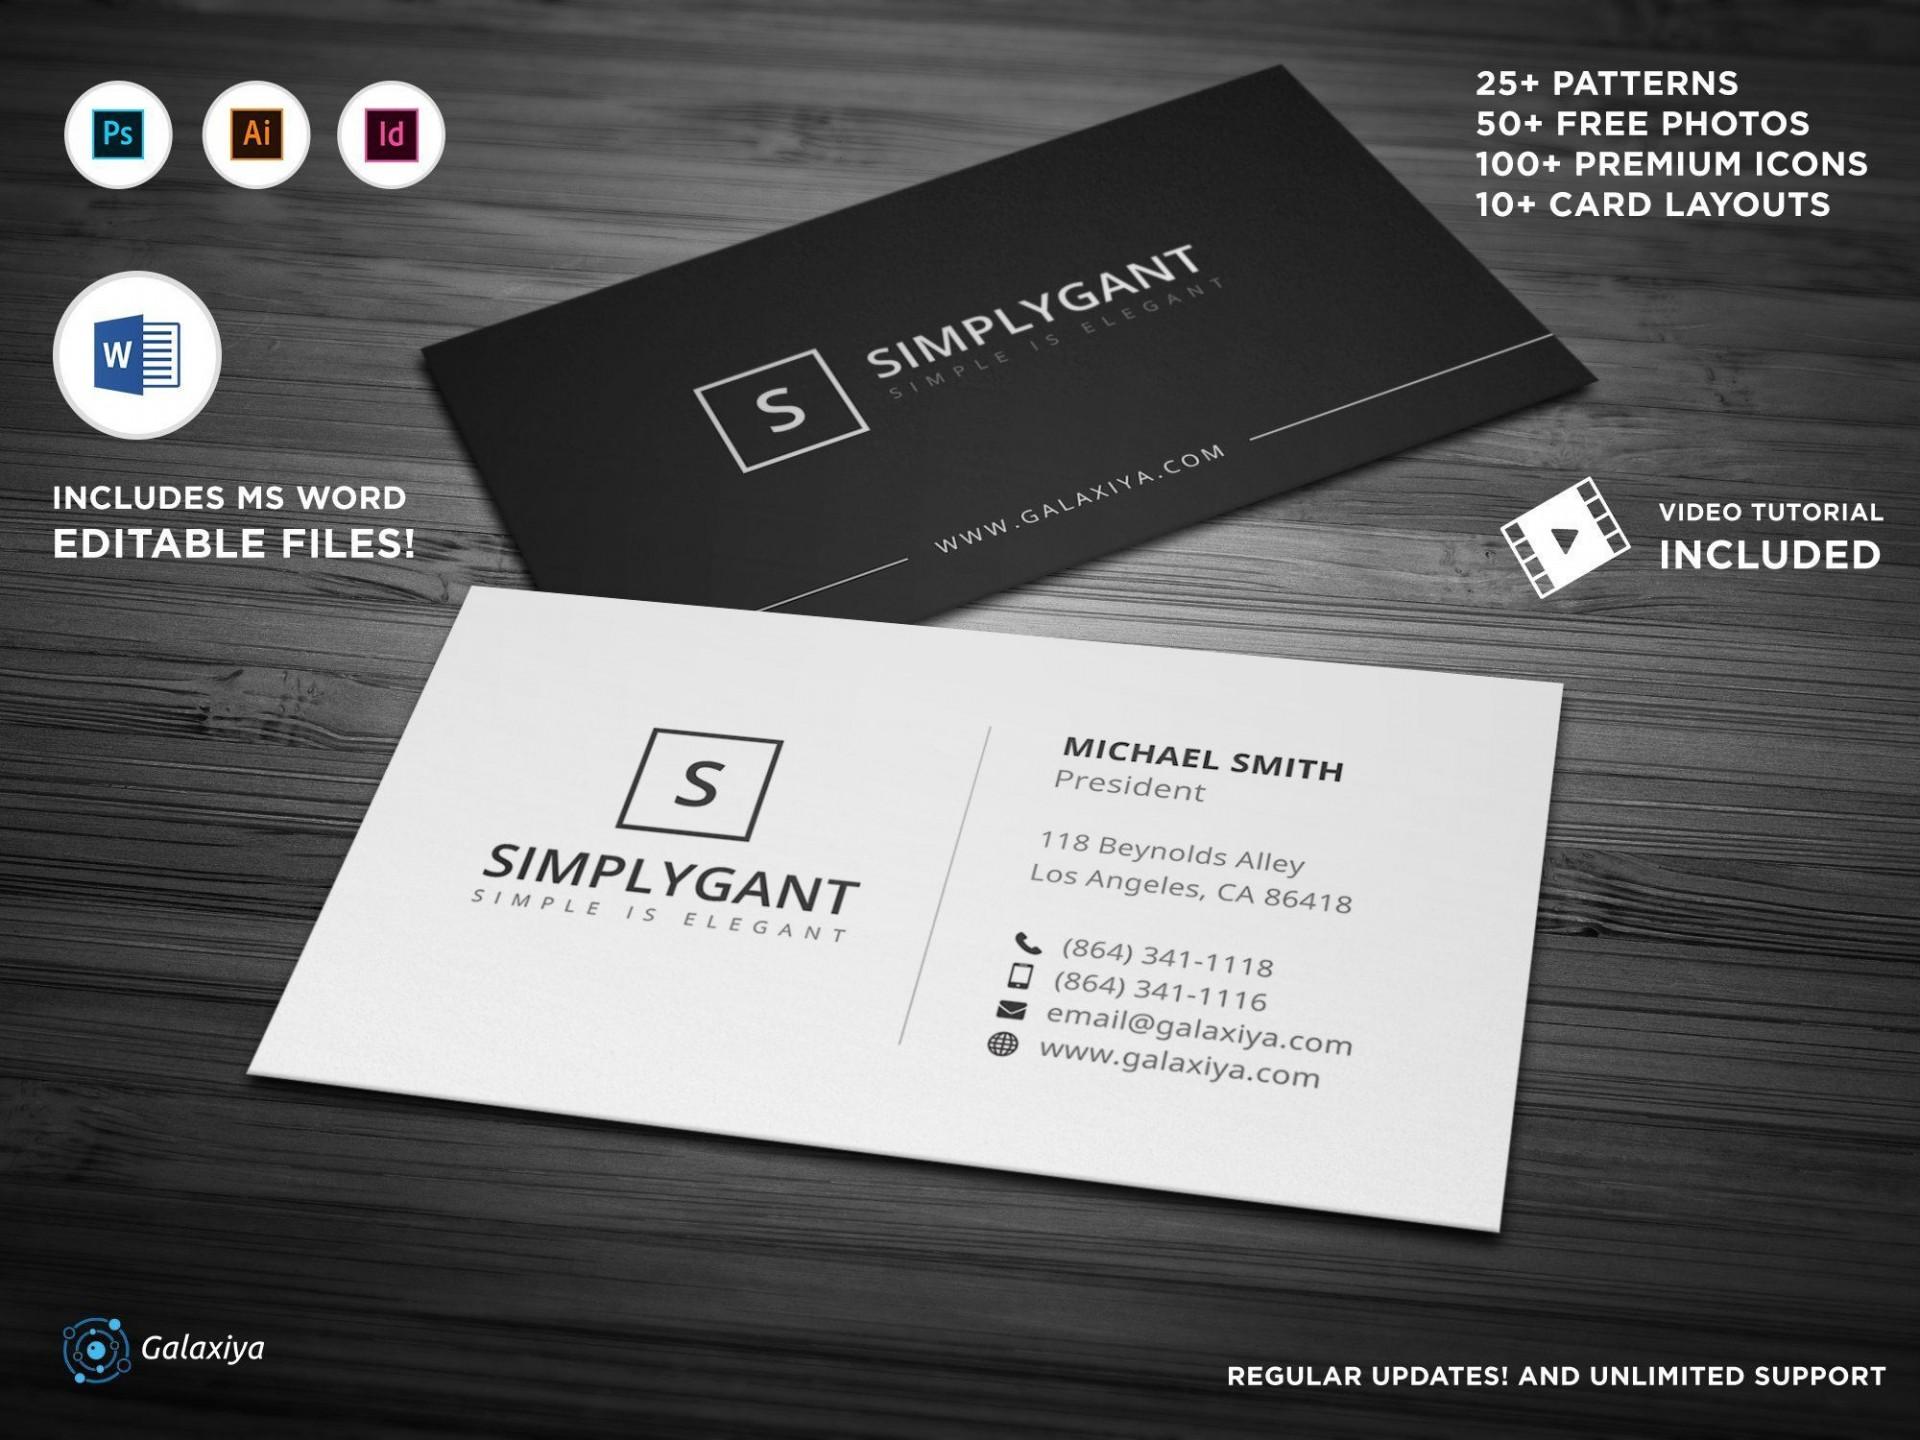 004 Surprising Simple Busines Card Template Free Design  Visiting Psd File Download Minimalist Basic1920